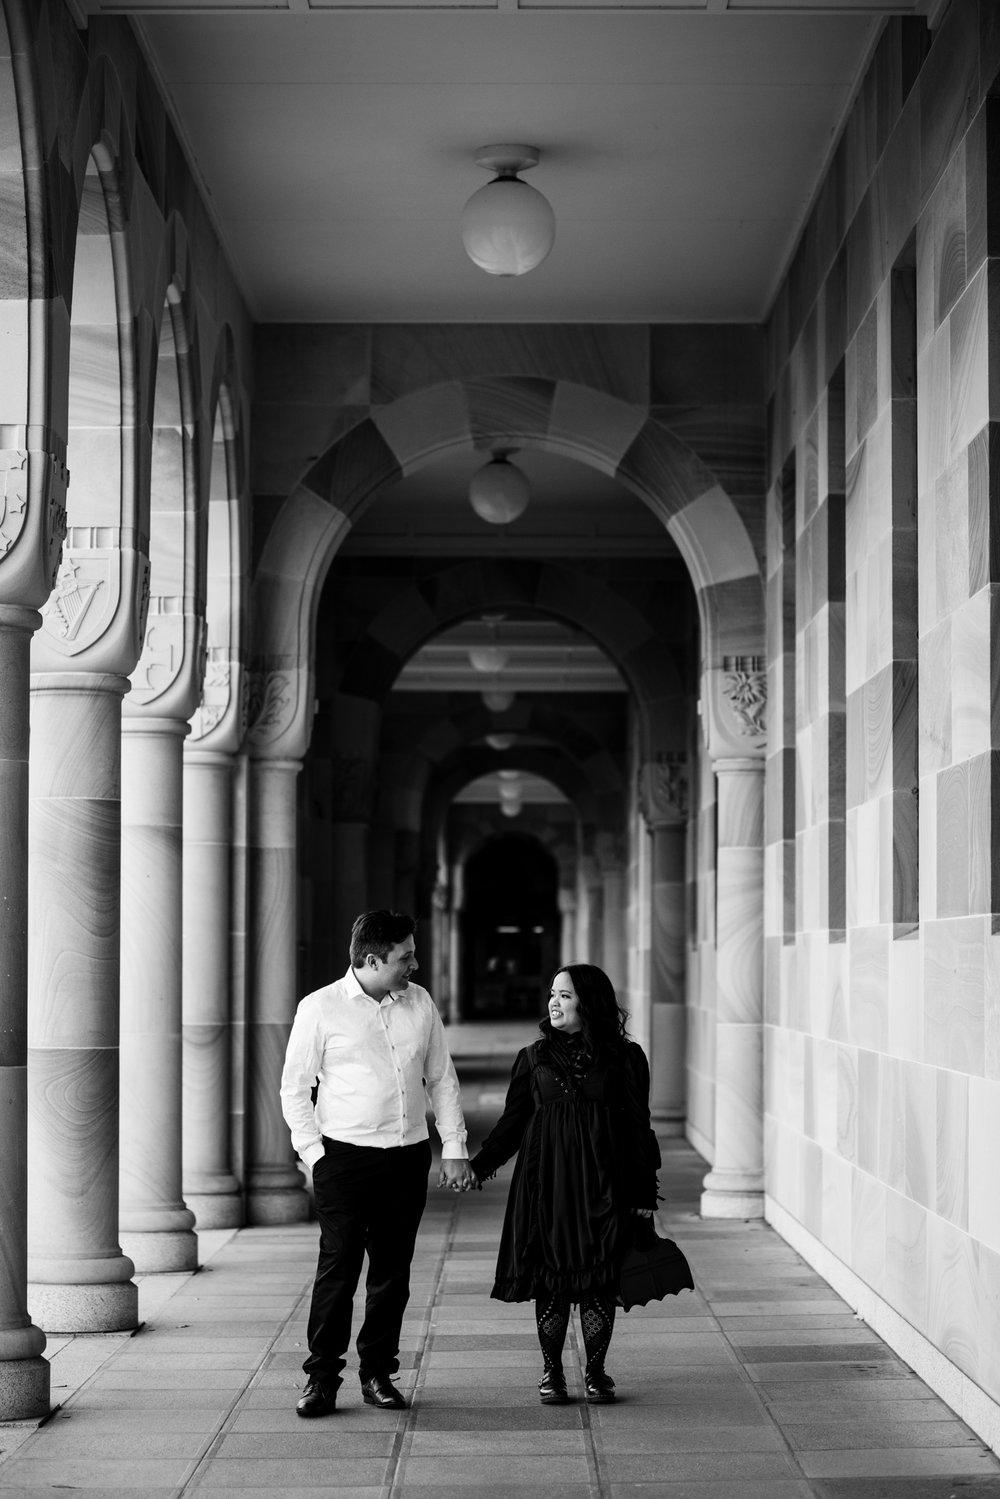 Brisbane Wedding Photographer | Engagement-Elopement Photography-6.jpg